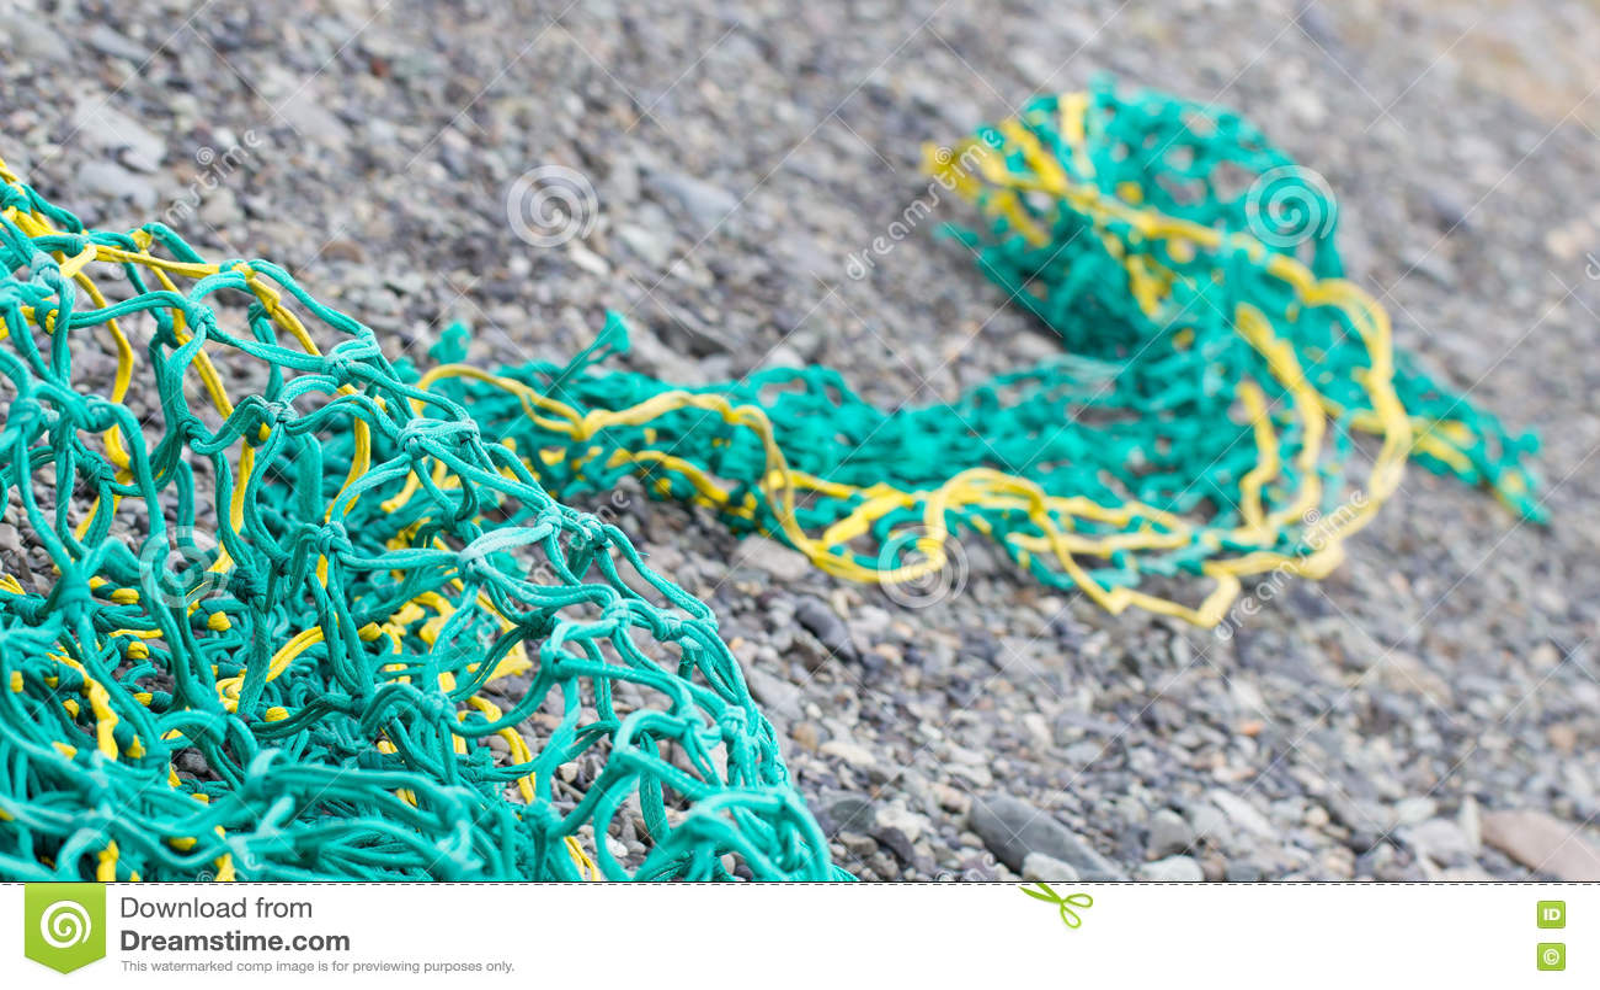 amature libre redes de pesca